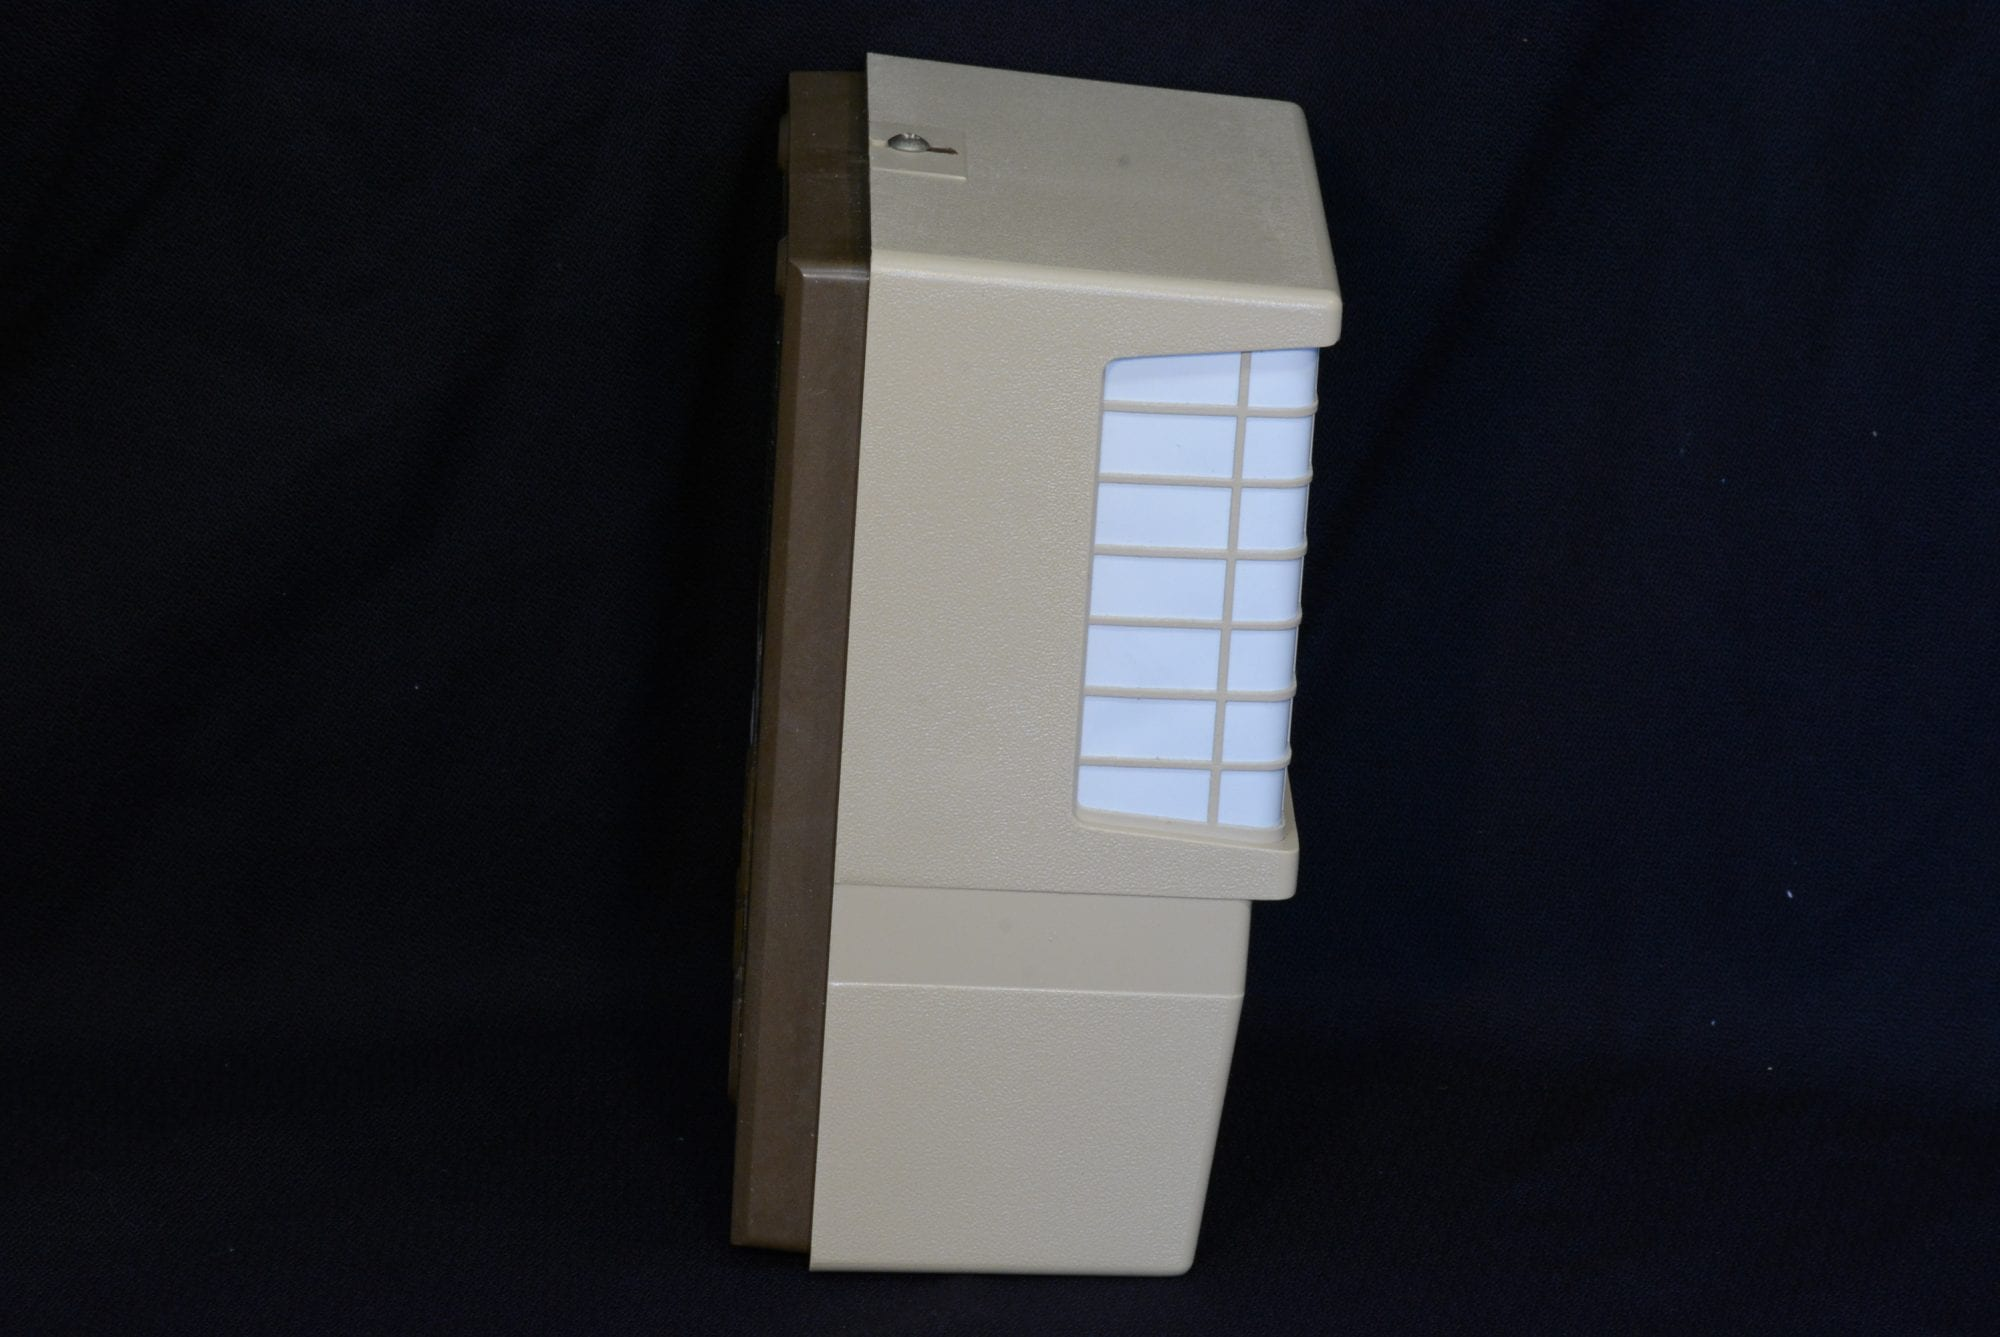 Raytek Bispy 8820 Motion Detector Wayne Alarm Systems